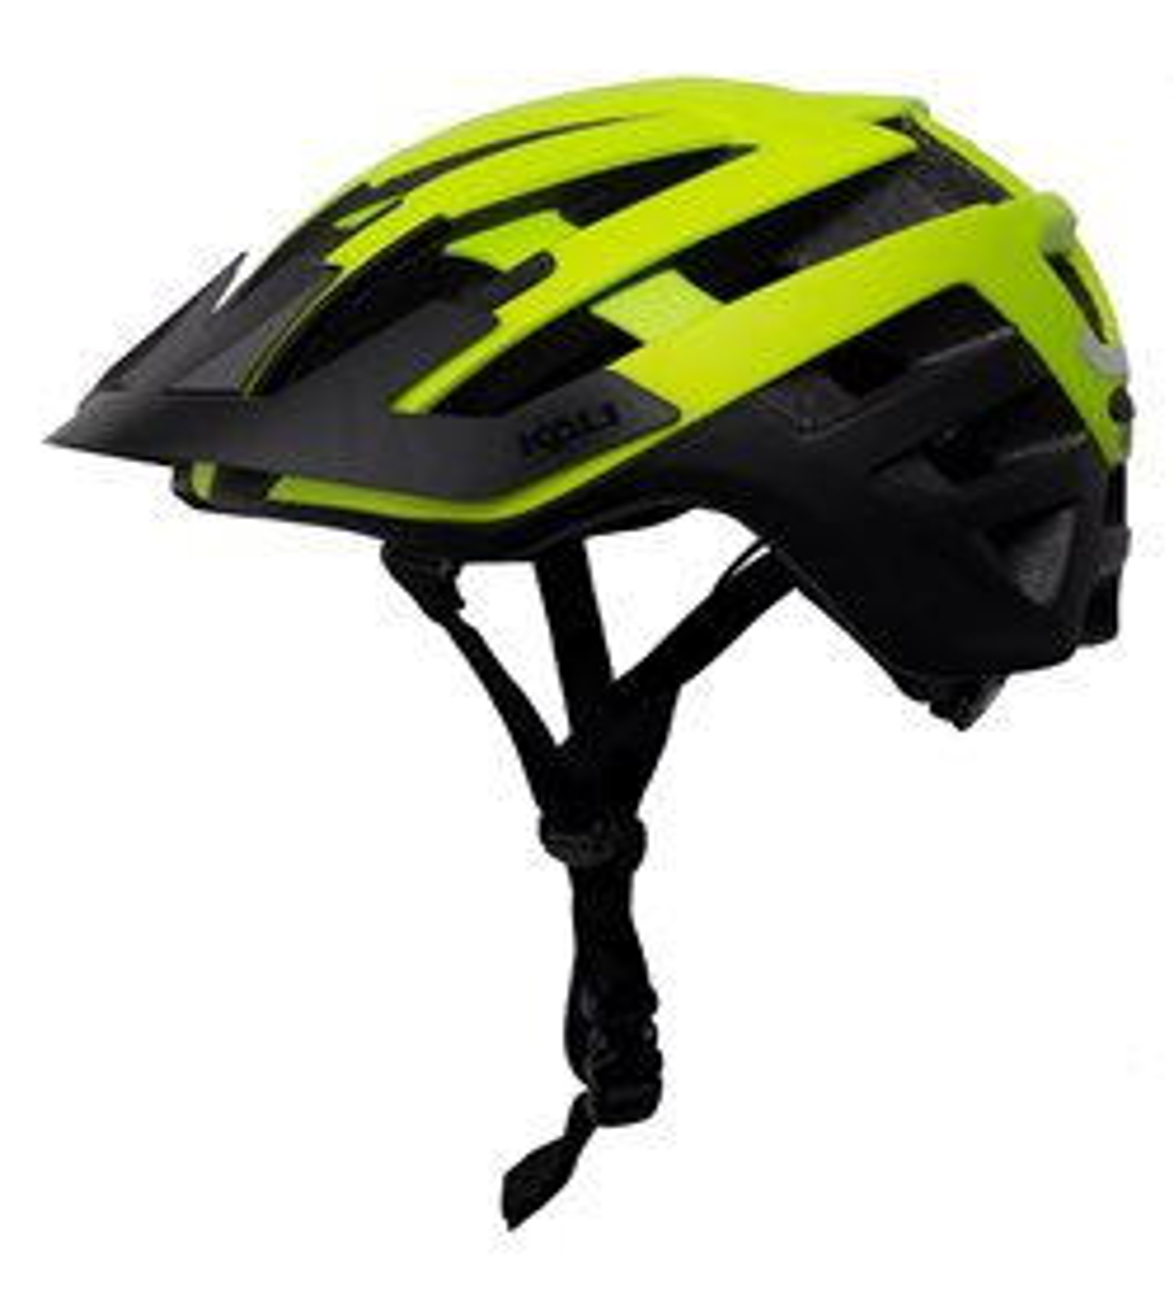 Kali Interceptor Helmet Men's Size Large/Extra Large in Matte Fluo Yellow/Black